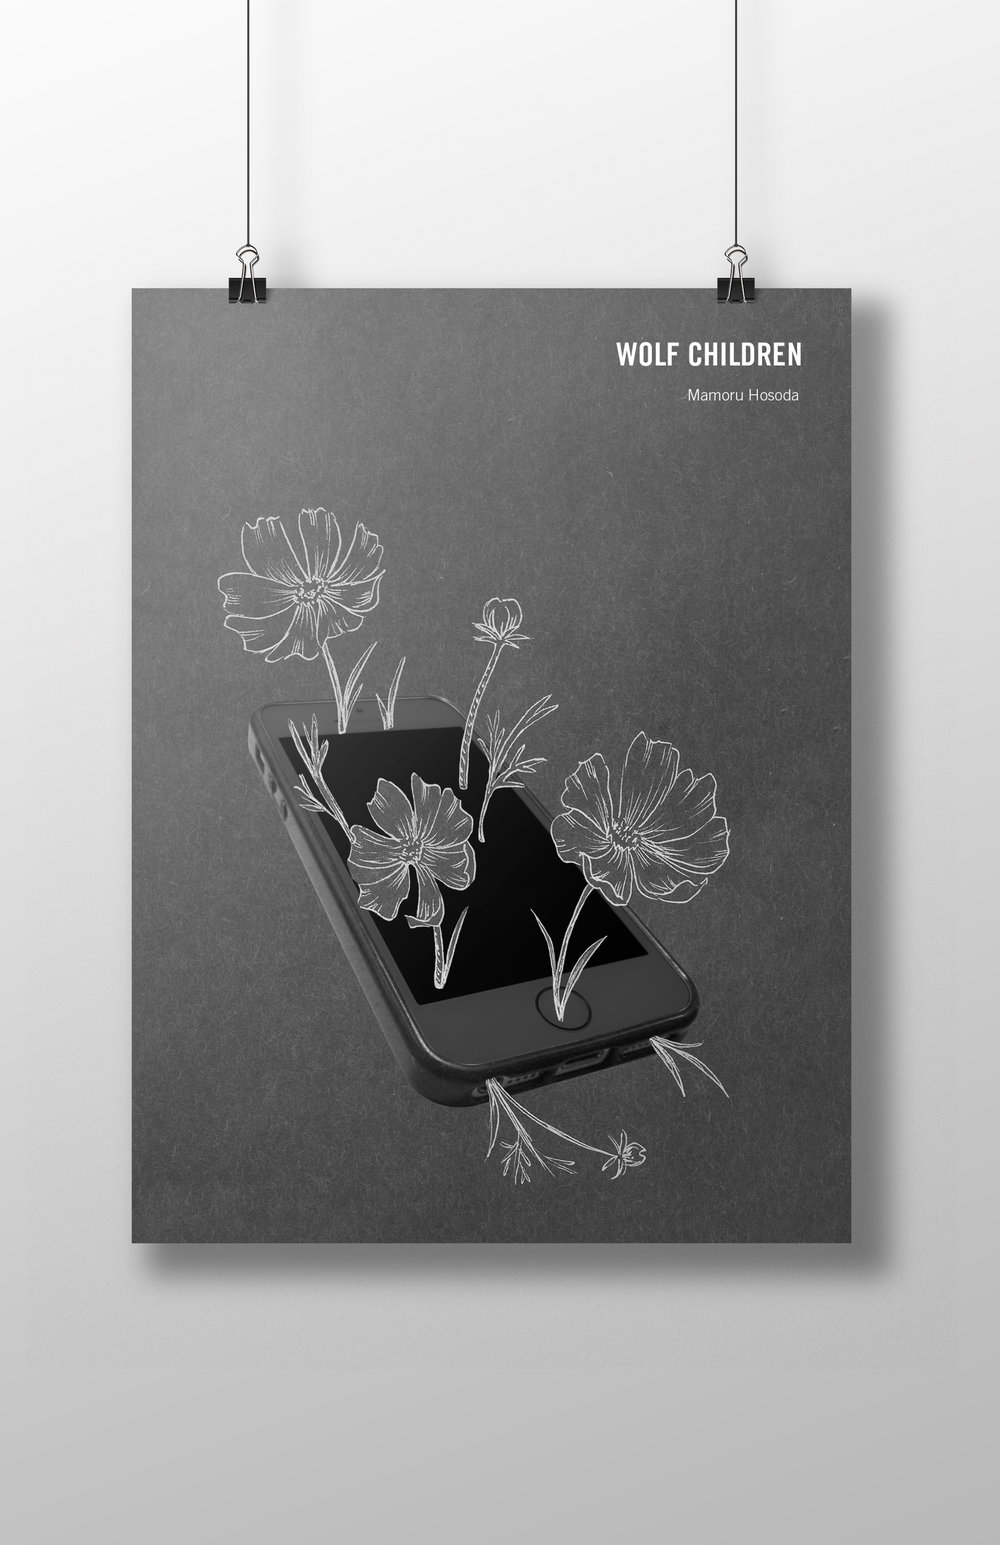 poster_mockup_WOLF CHILDREN 11x17.jpg